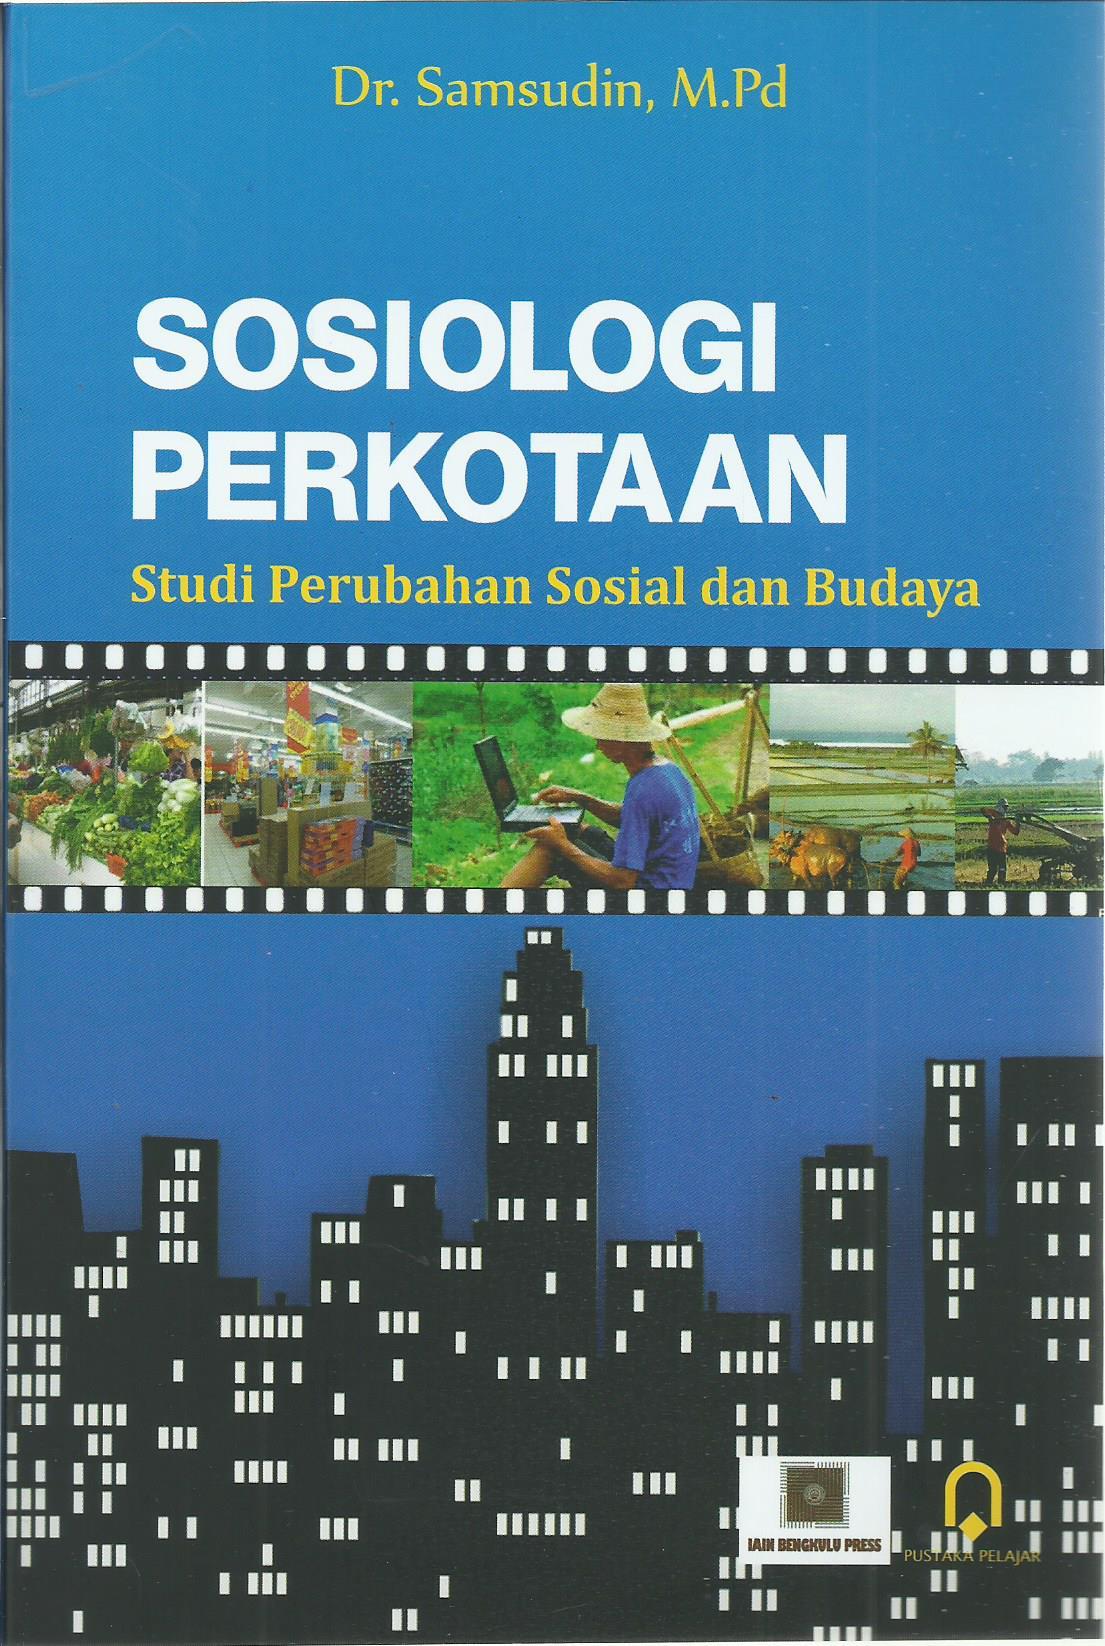 Sosiologi Perkotaan Studi Prubahan Sosial Dan Budaya